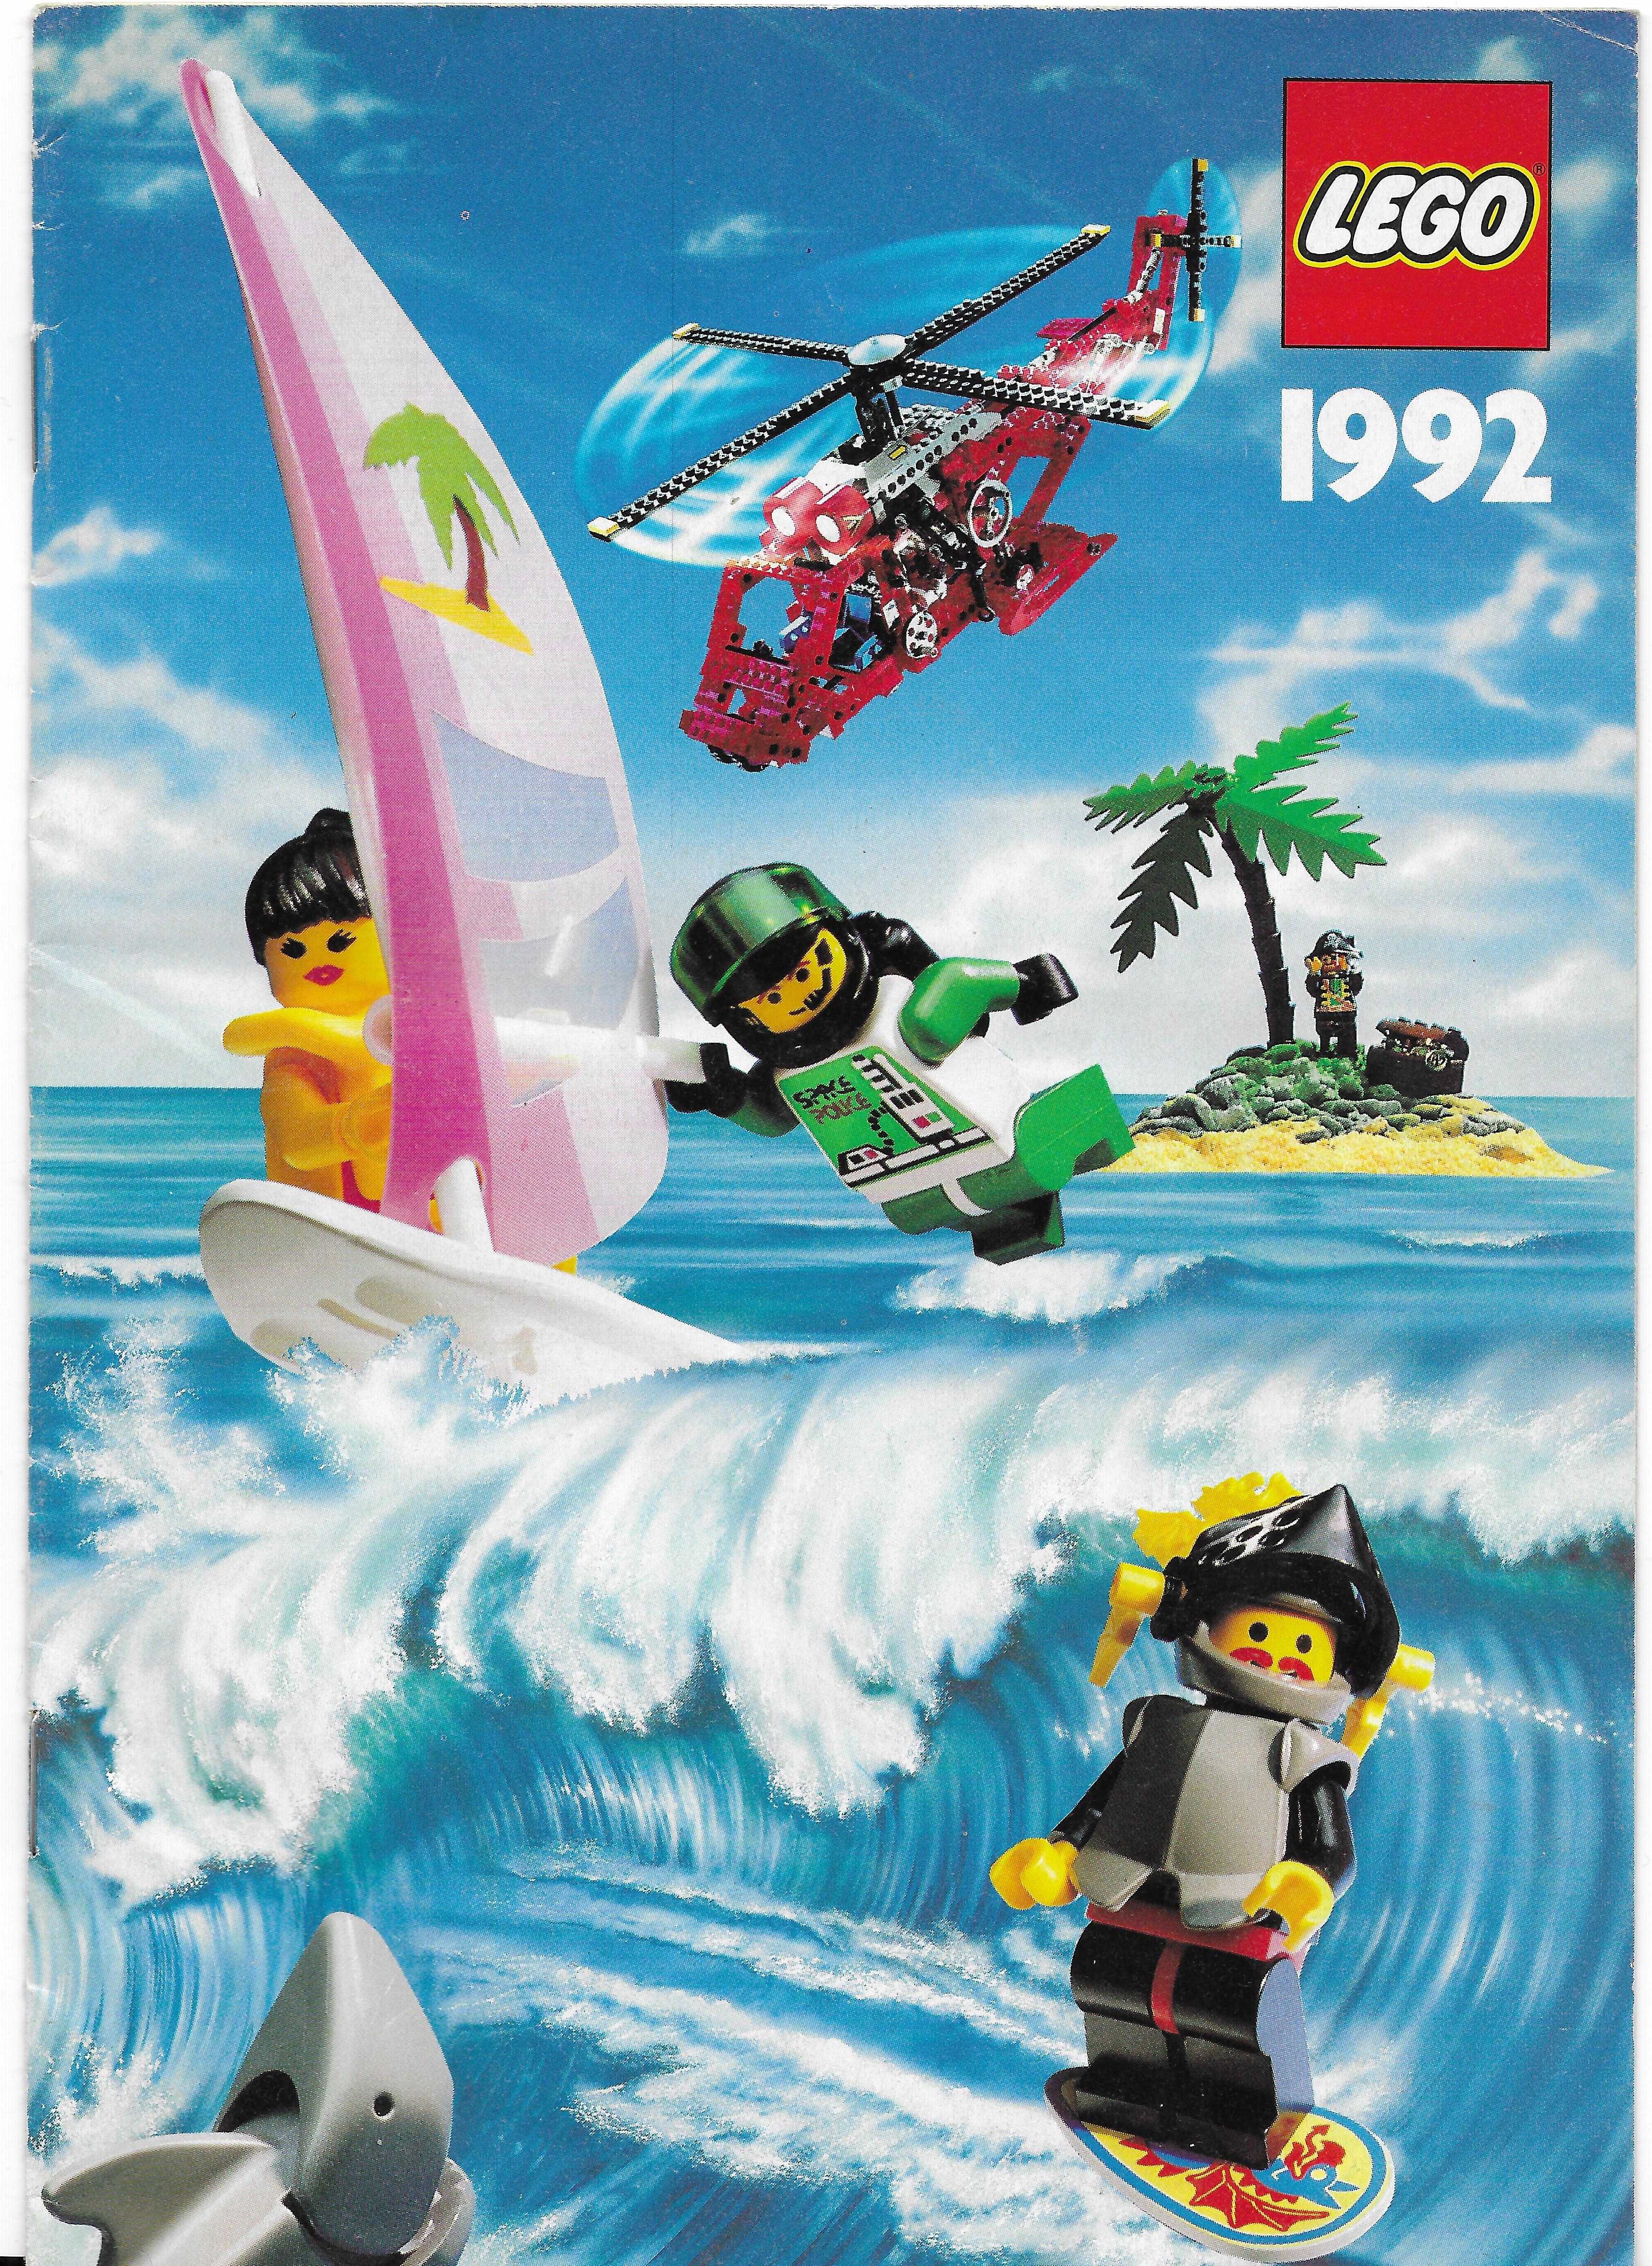 1992-es magyar Lego katalógus